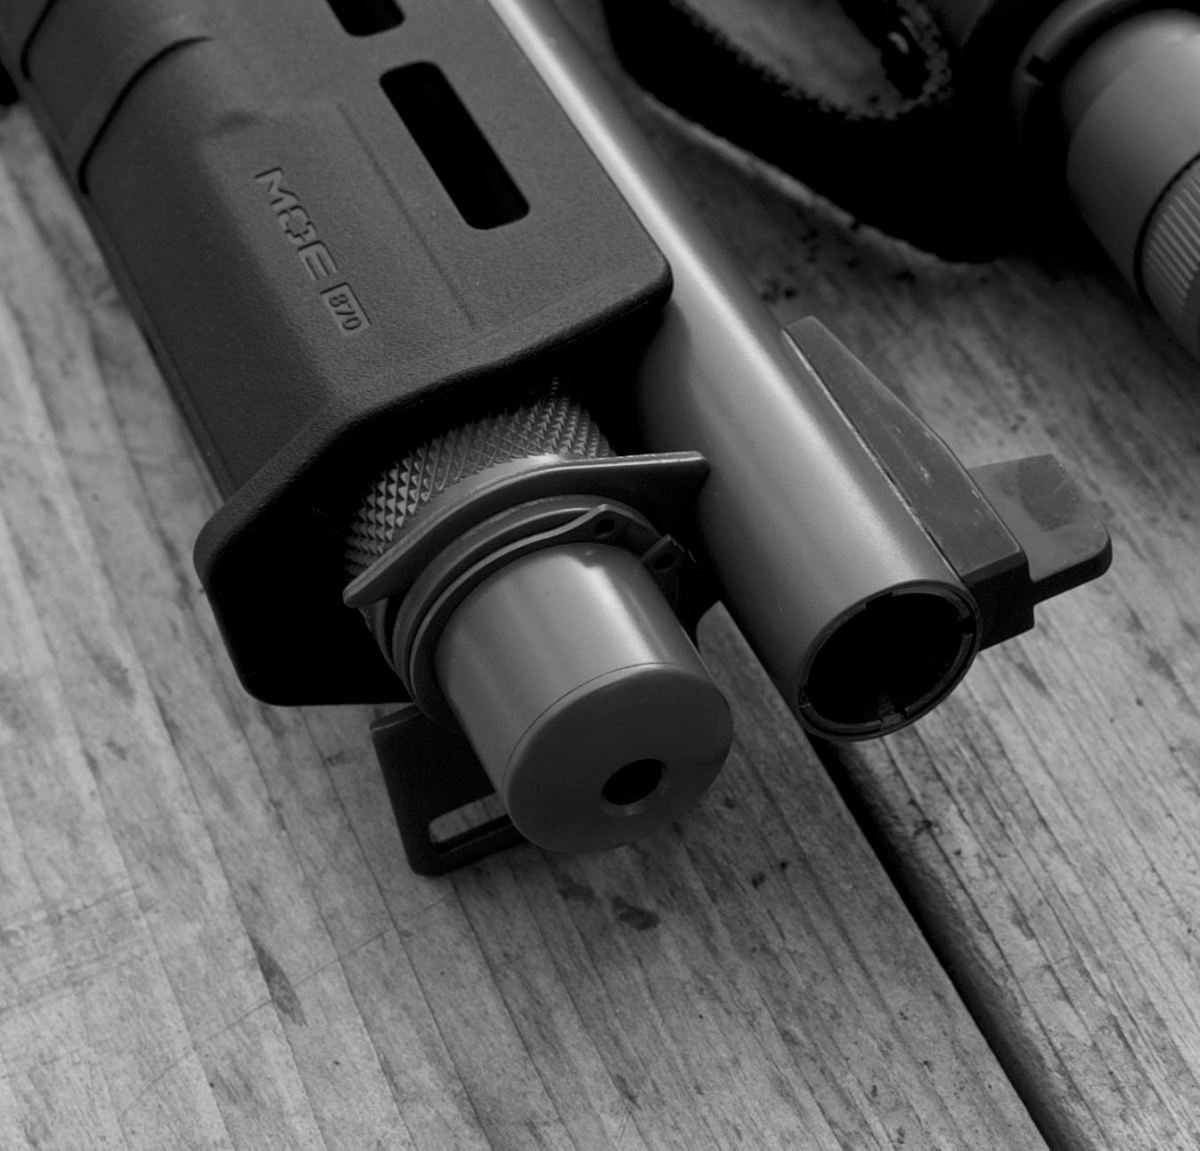 Remington 870 magazine dimple removal